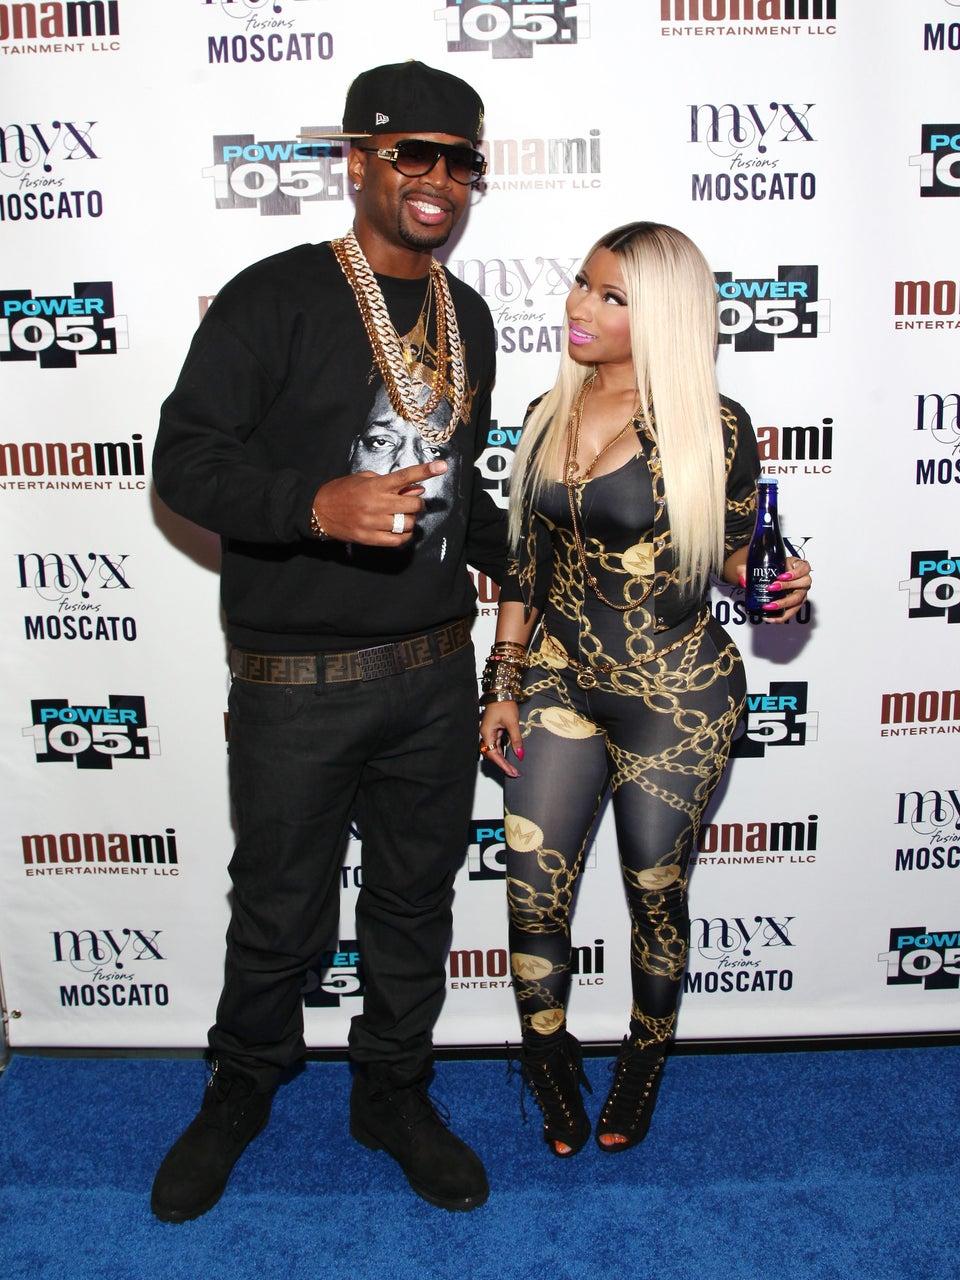 Uh-Oh! Nicki Minaj's Ex Safaree Samuels Could be Taking Her to Court